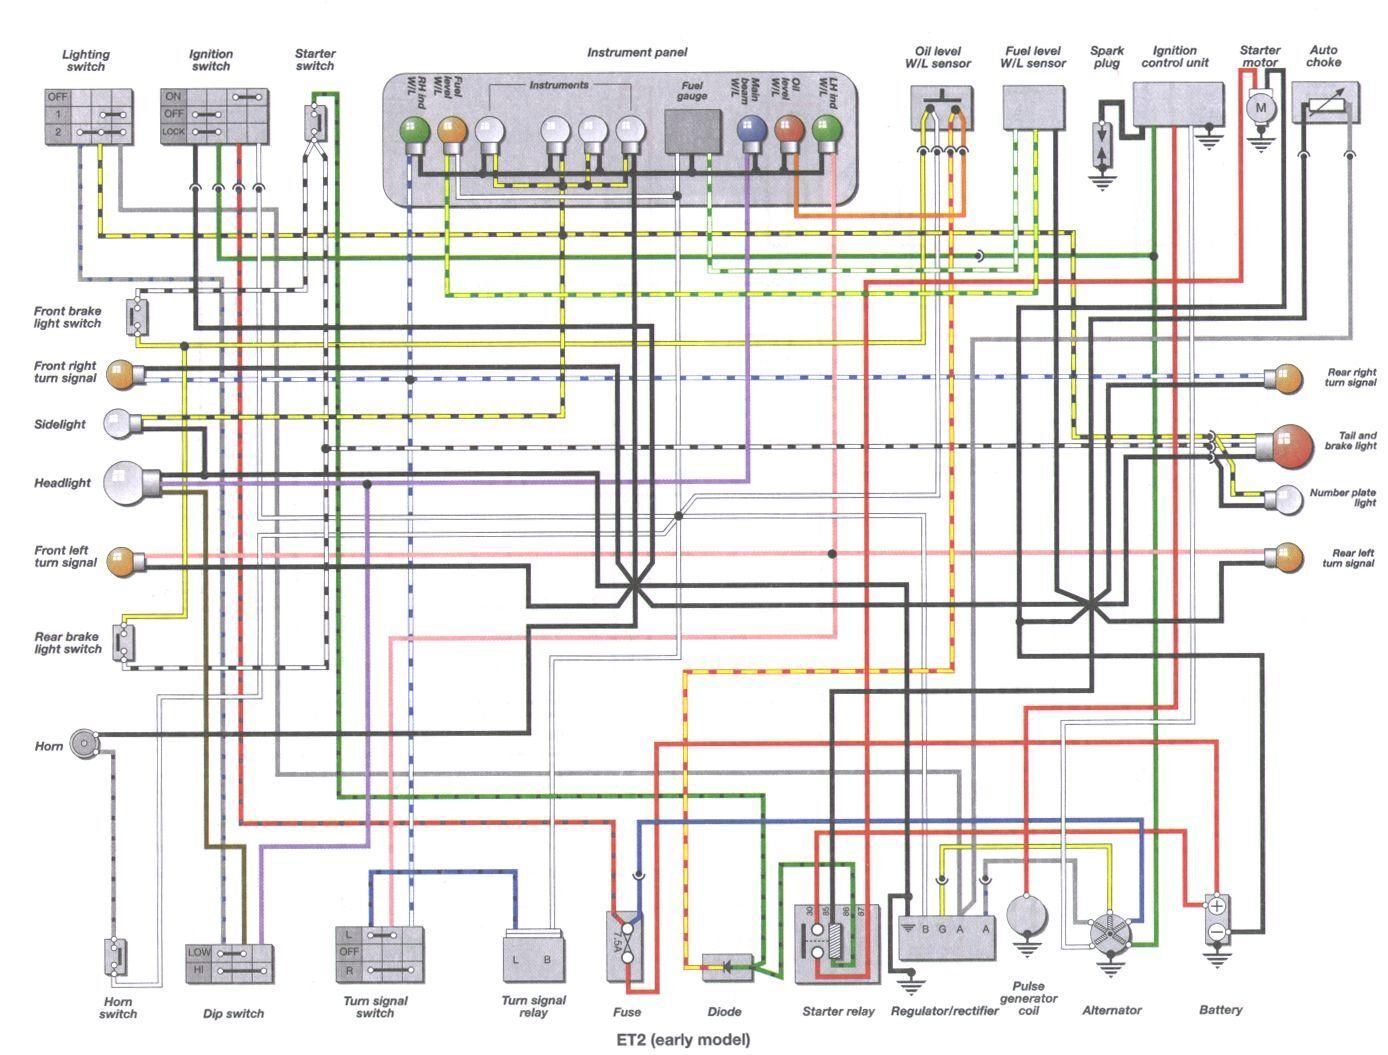 charming piaggio typhoon wiring diagram photos best image wiring diagram imusa us Honda Ruckus Turbo Honda Ruckus Specs